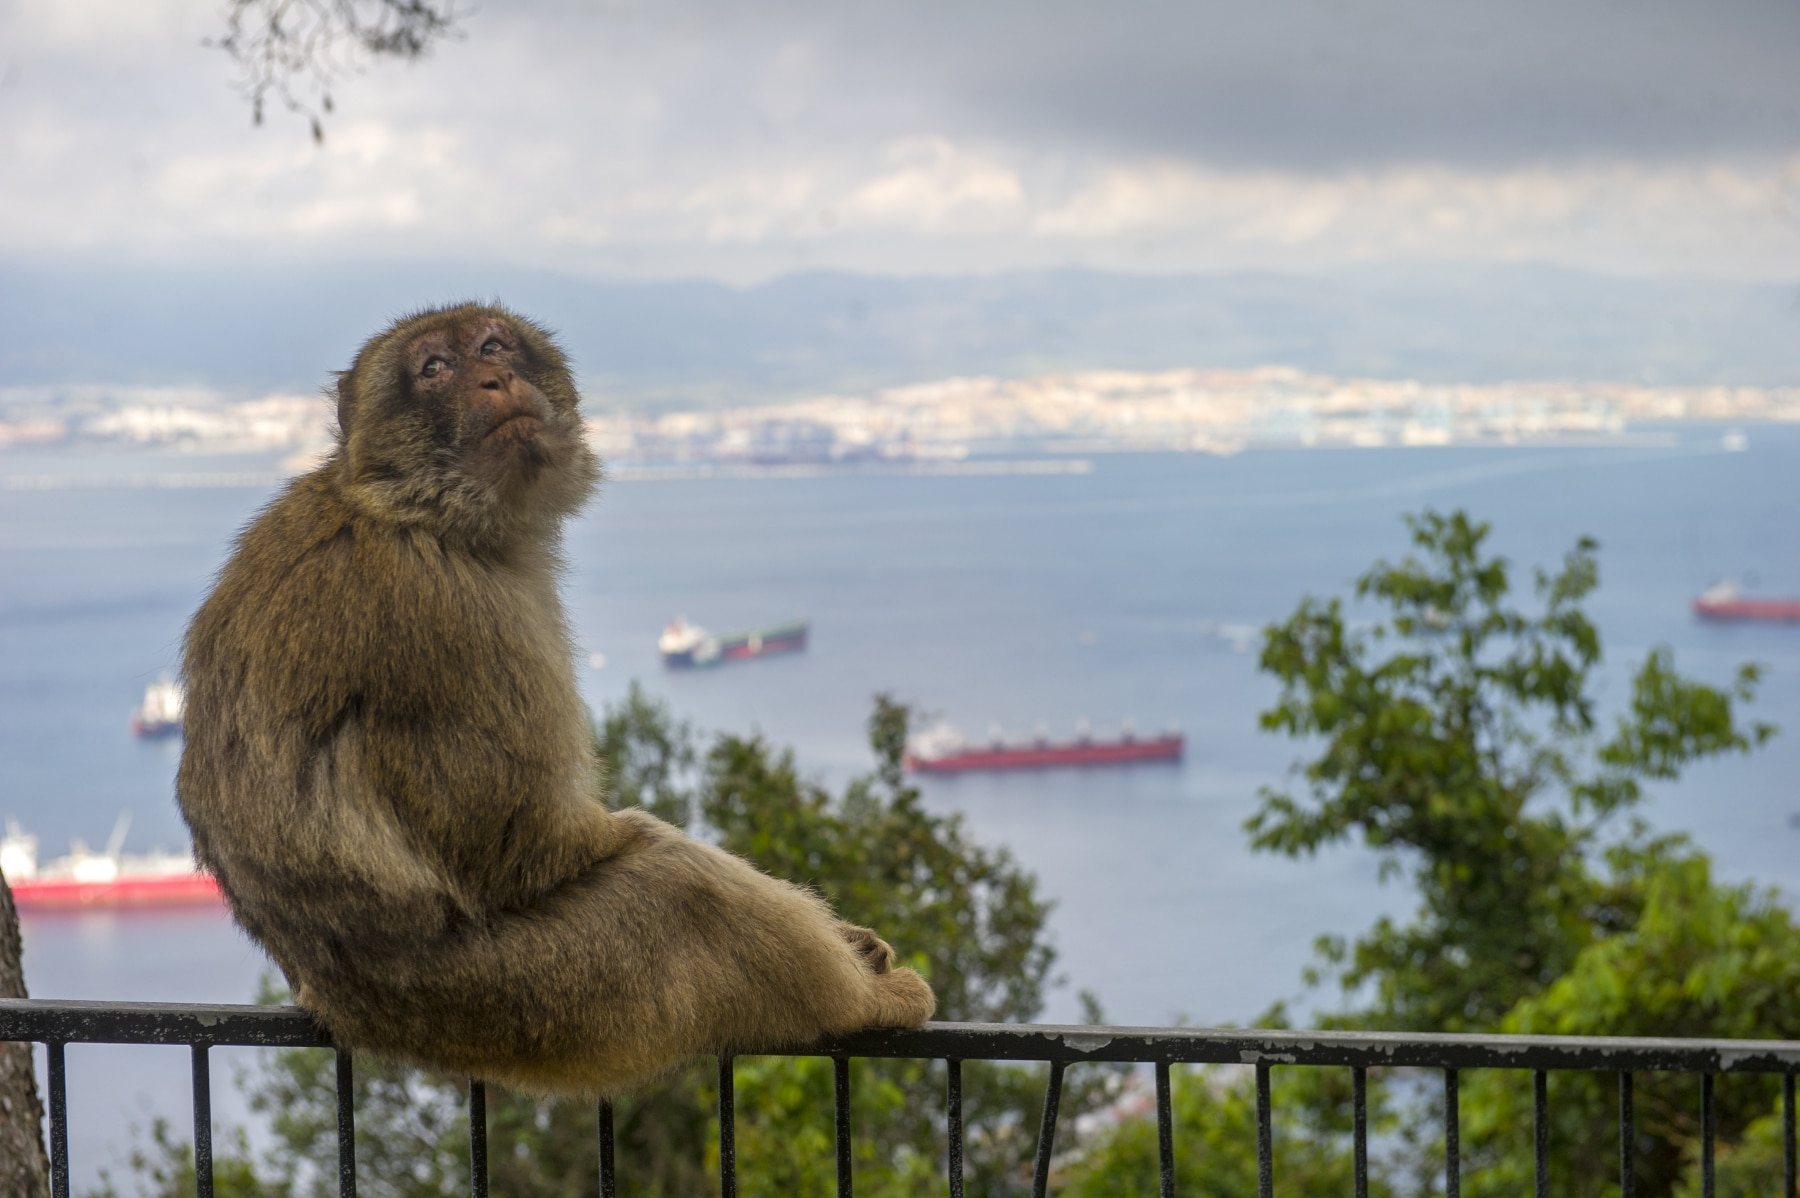 monos-zona-alta-del-pen-con-turistas-01_9225070430_o